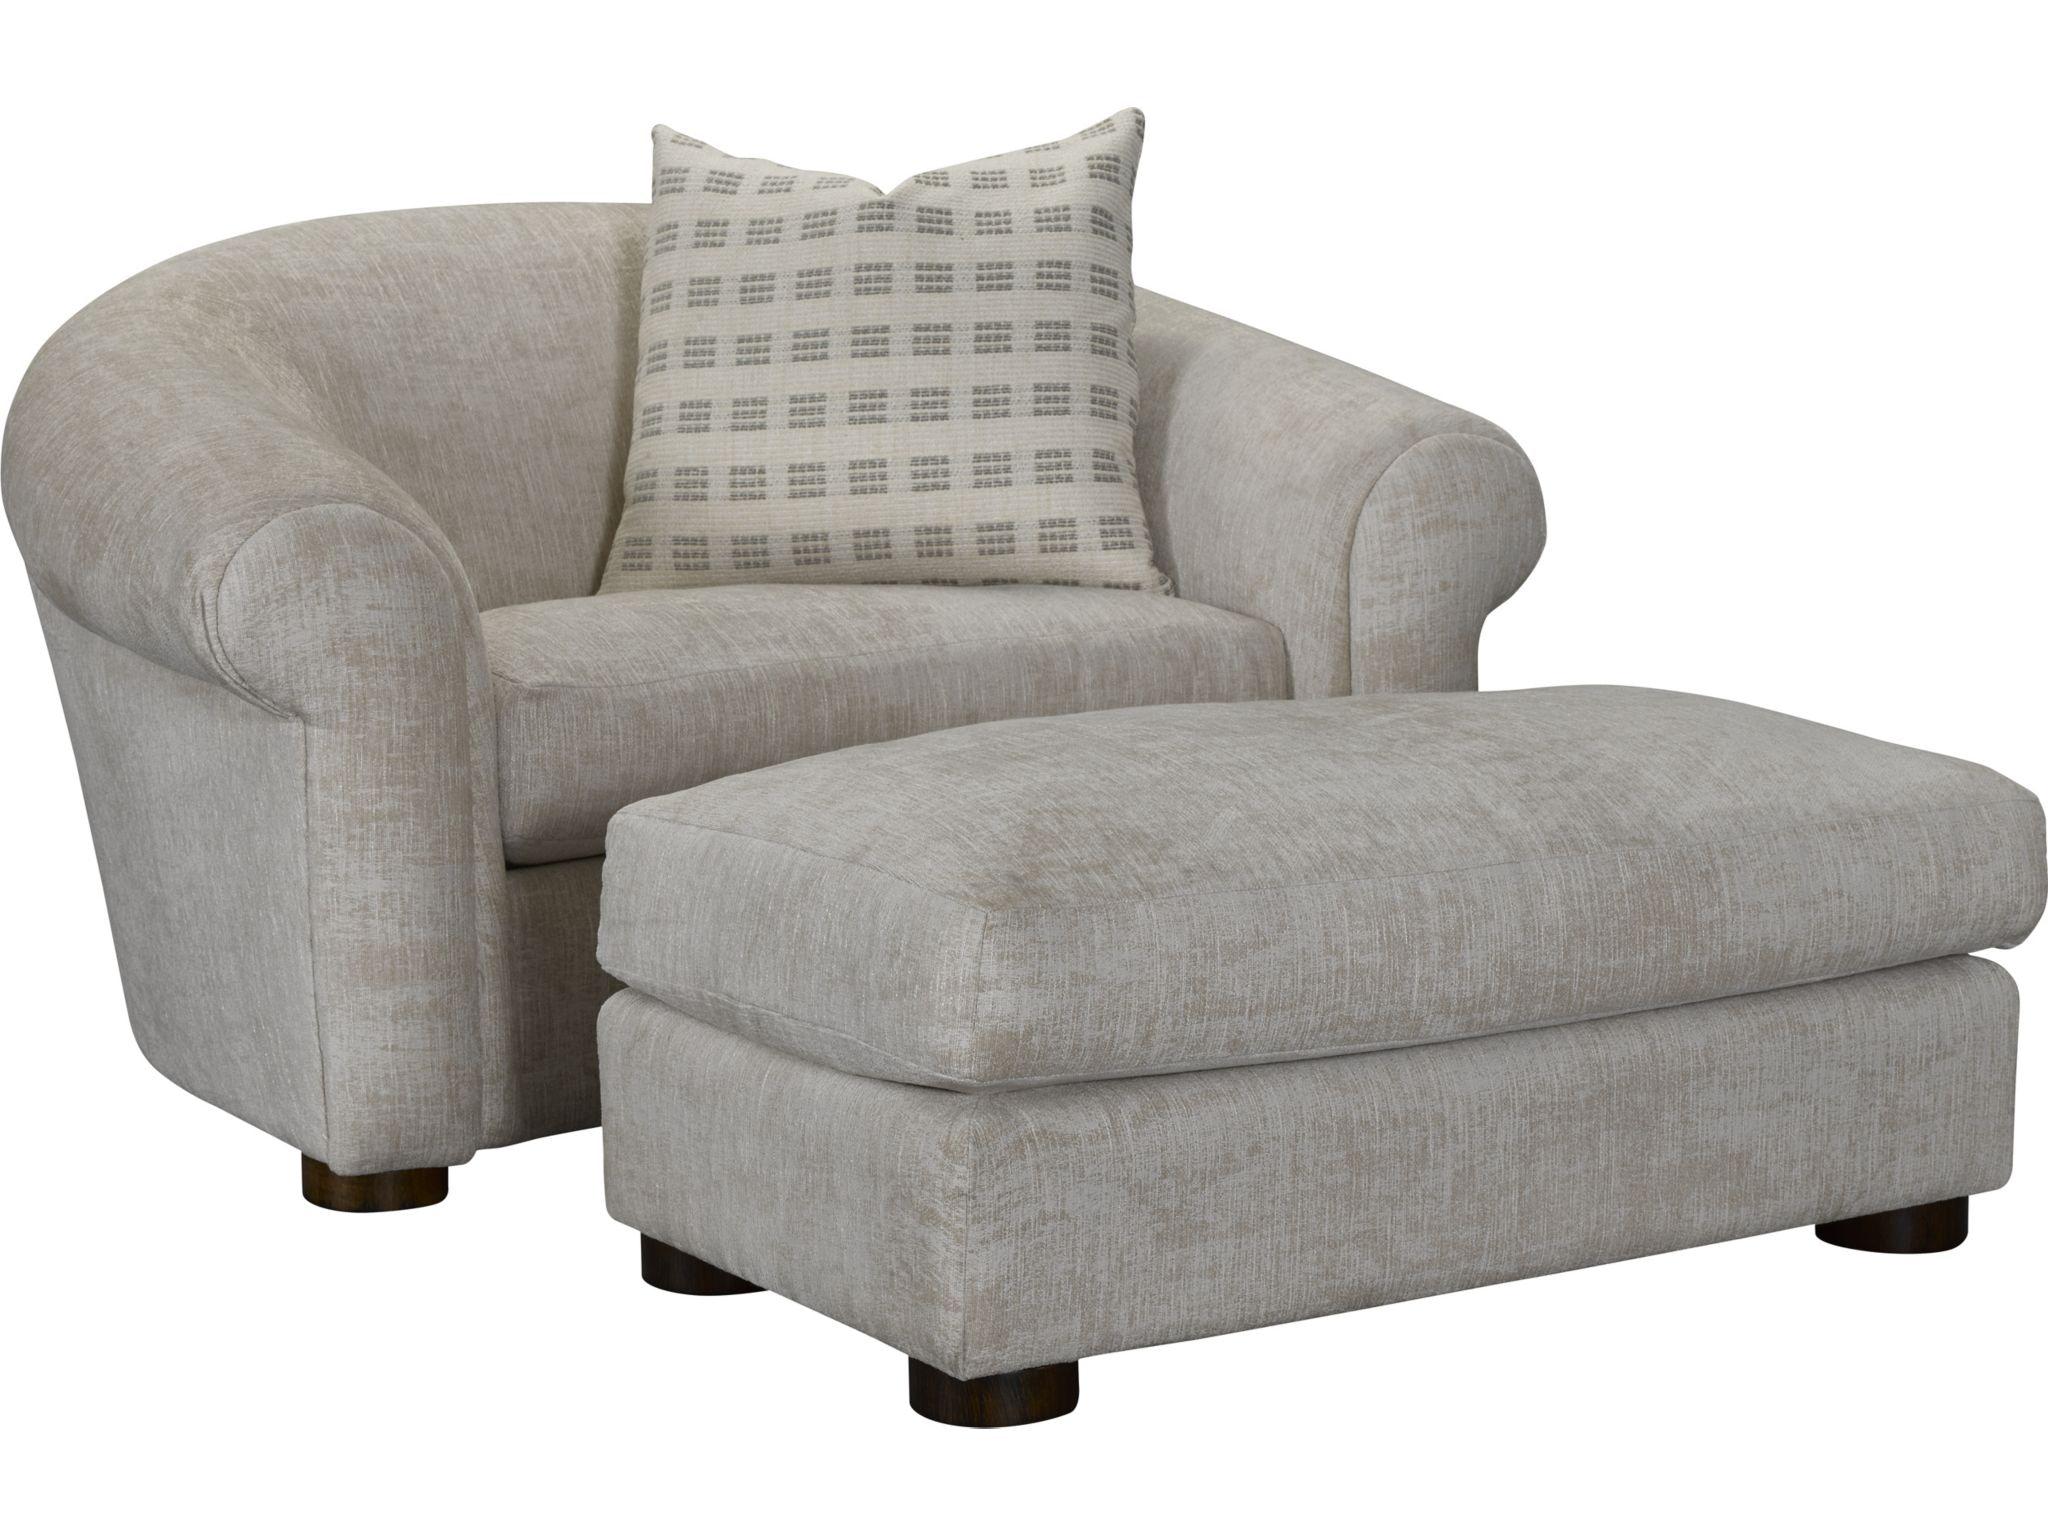 Thomasville Furniture - Art Sample Furniture - Saginaw, MI